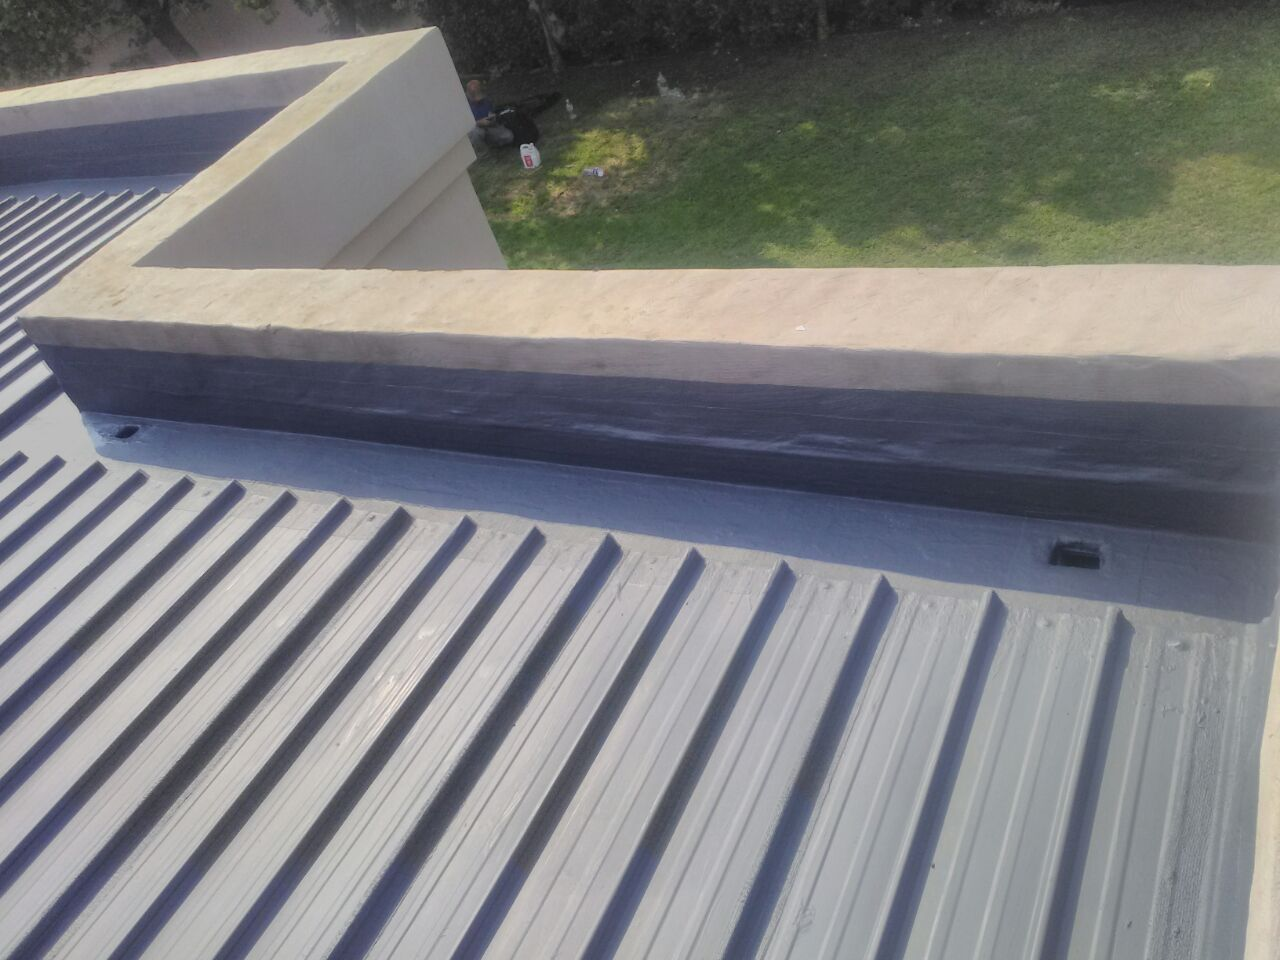 Contact Roof Repairs Pretoria